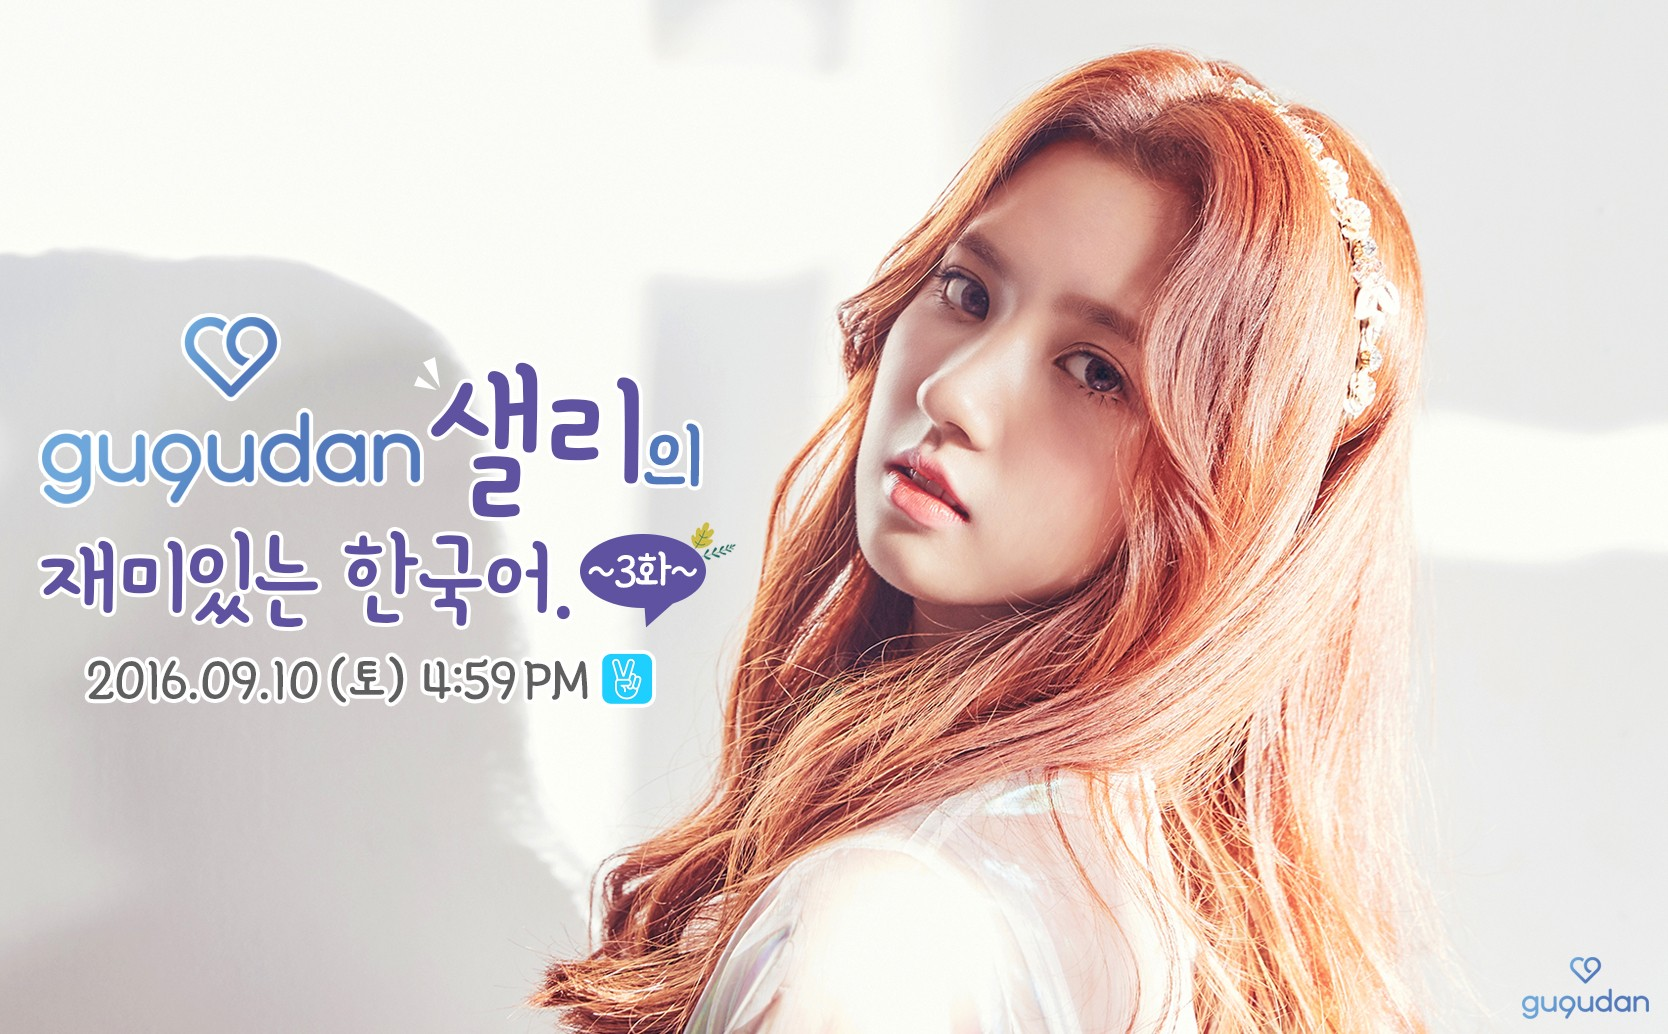 gugudan 샐리의 재미있는 한국어. ~3화~